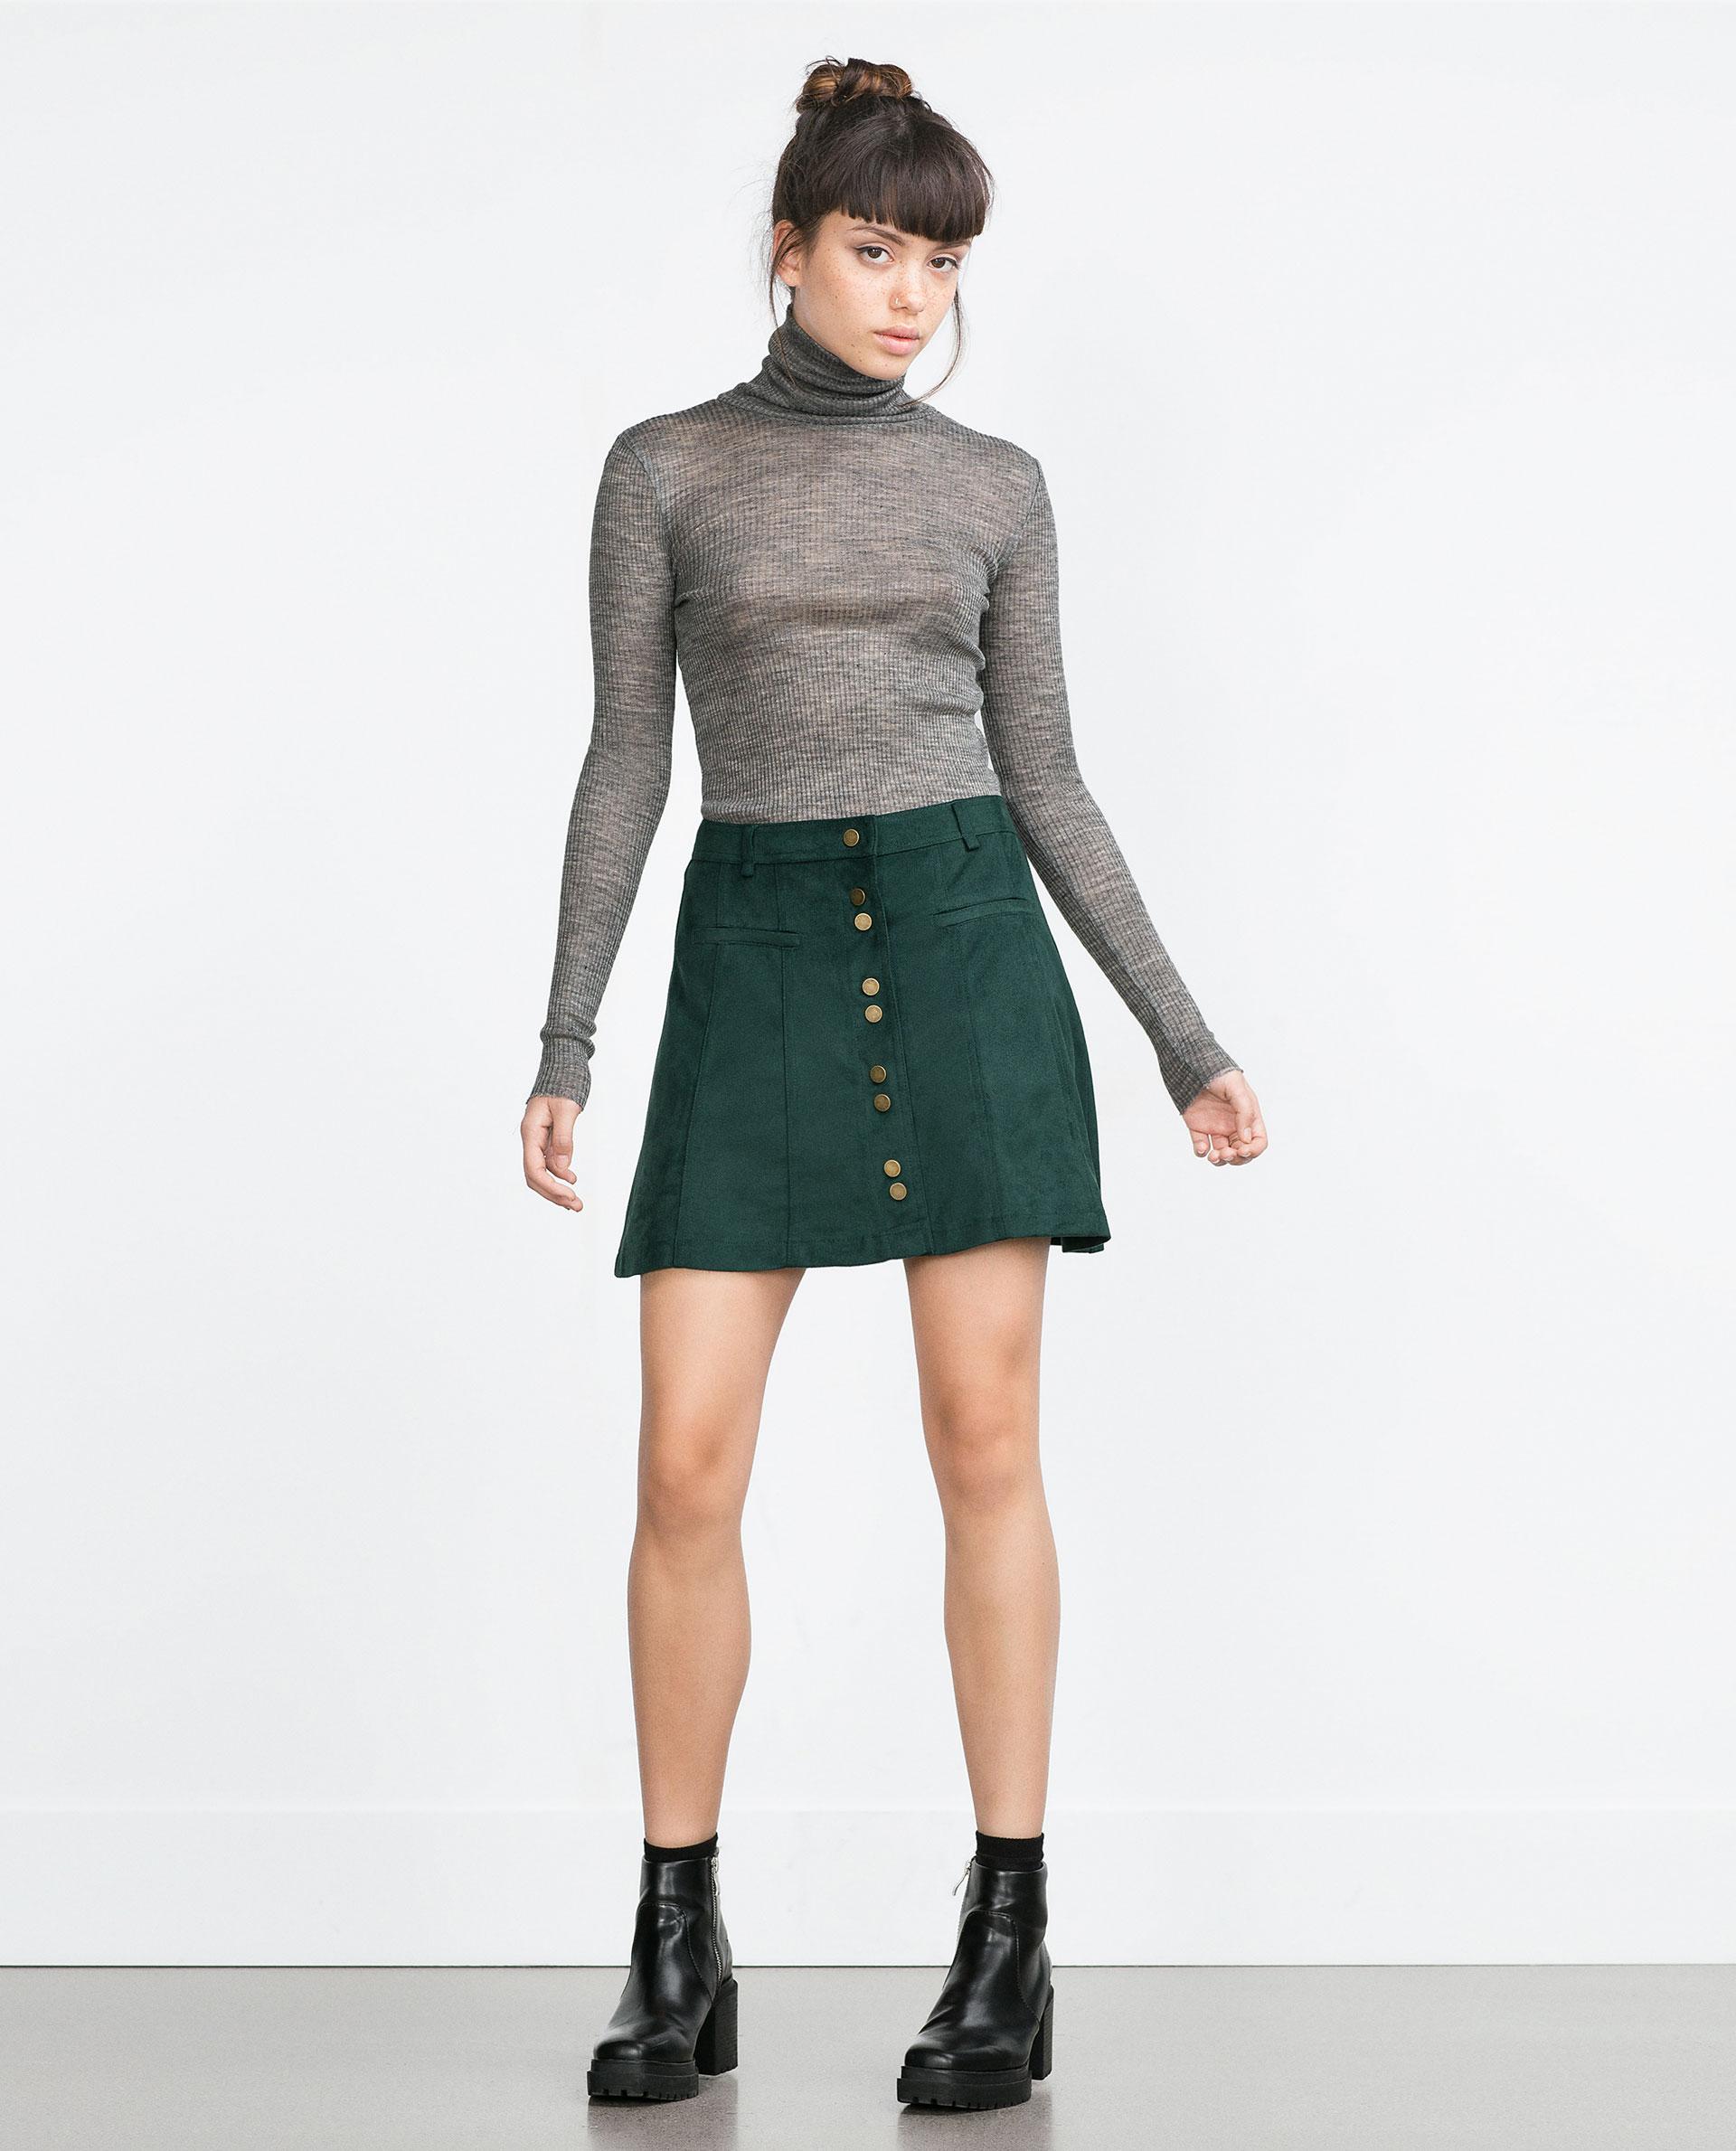 Mini skirts in france Miniskirt With Buttons Mini Skirts Woman Zara France